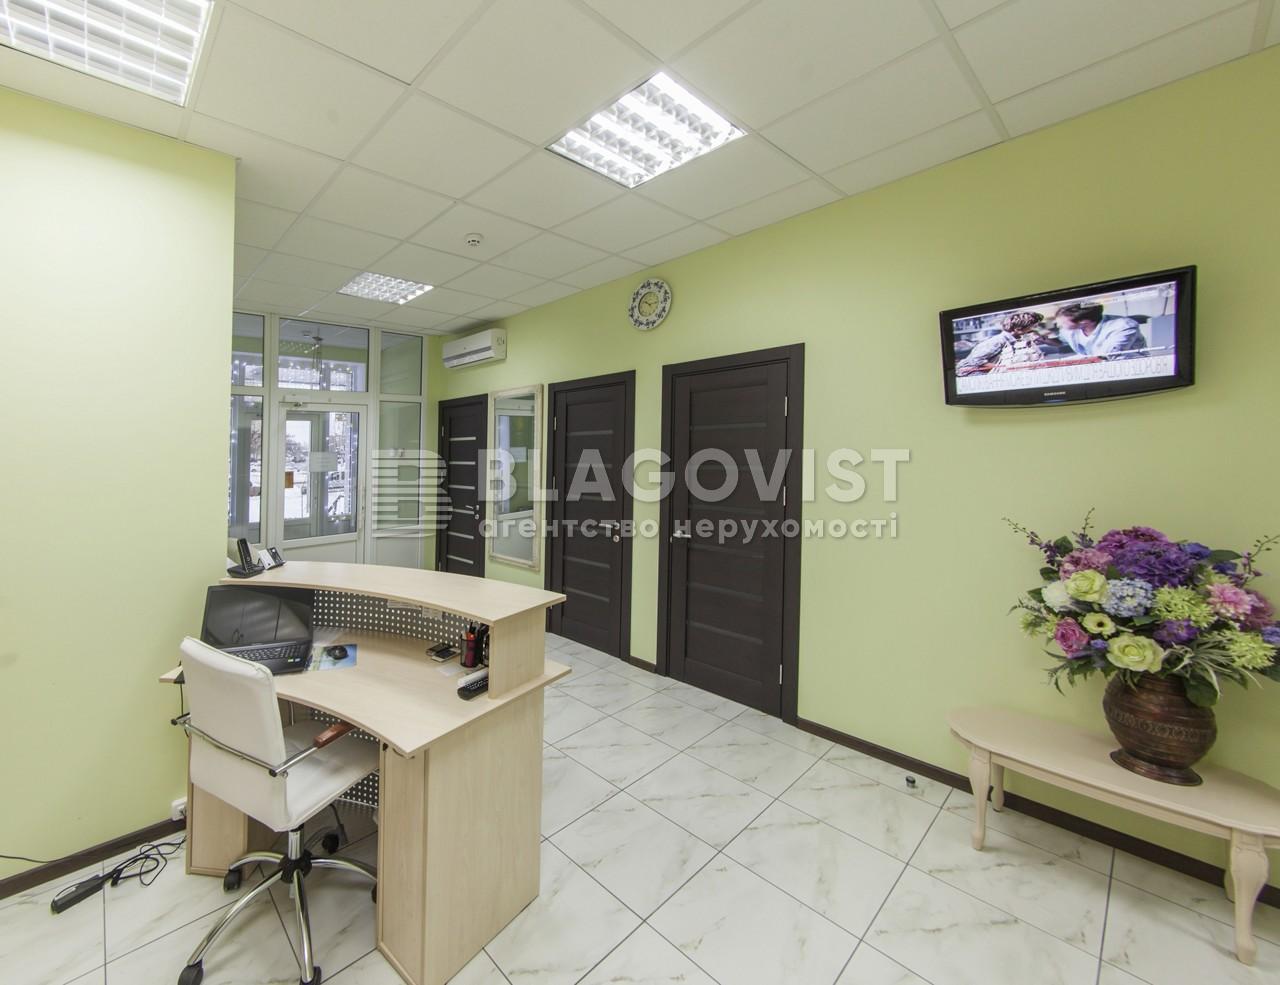 Нежитлове приміщення, P-17282, Ахматової Анни, Київ - Фото 1